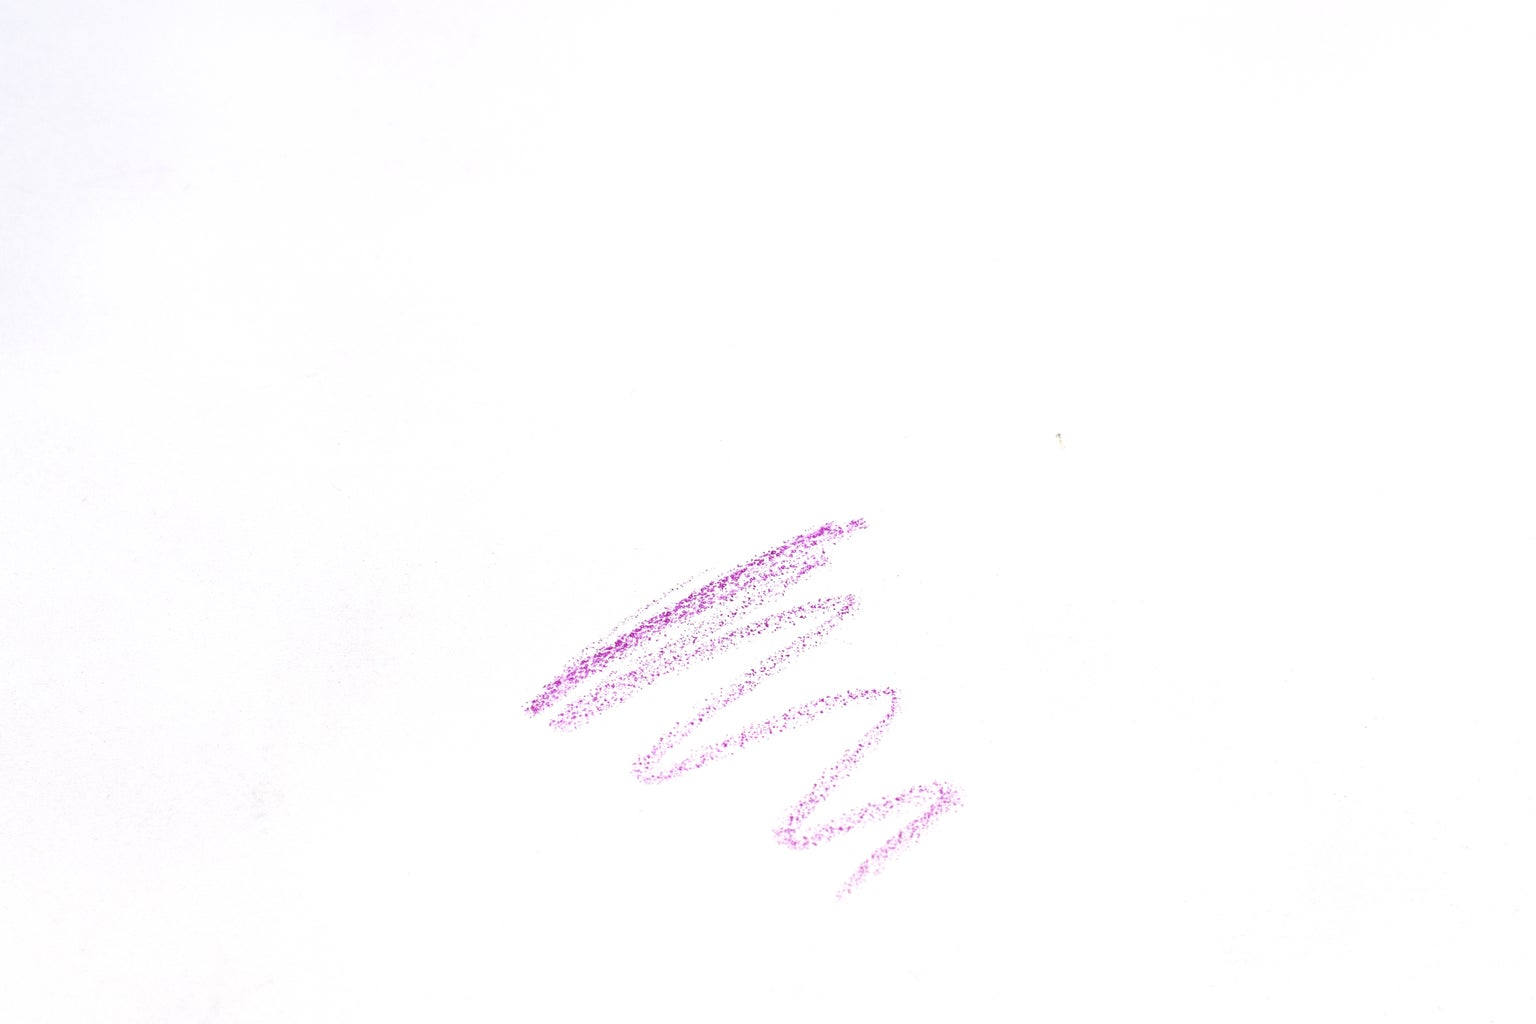 Crayon + Marker Removal